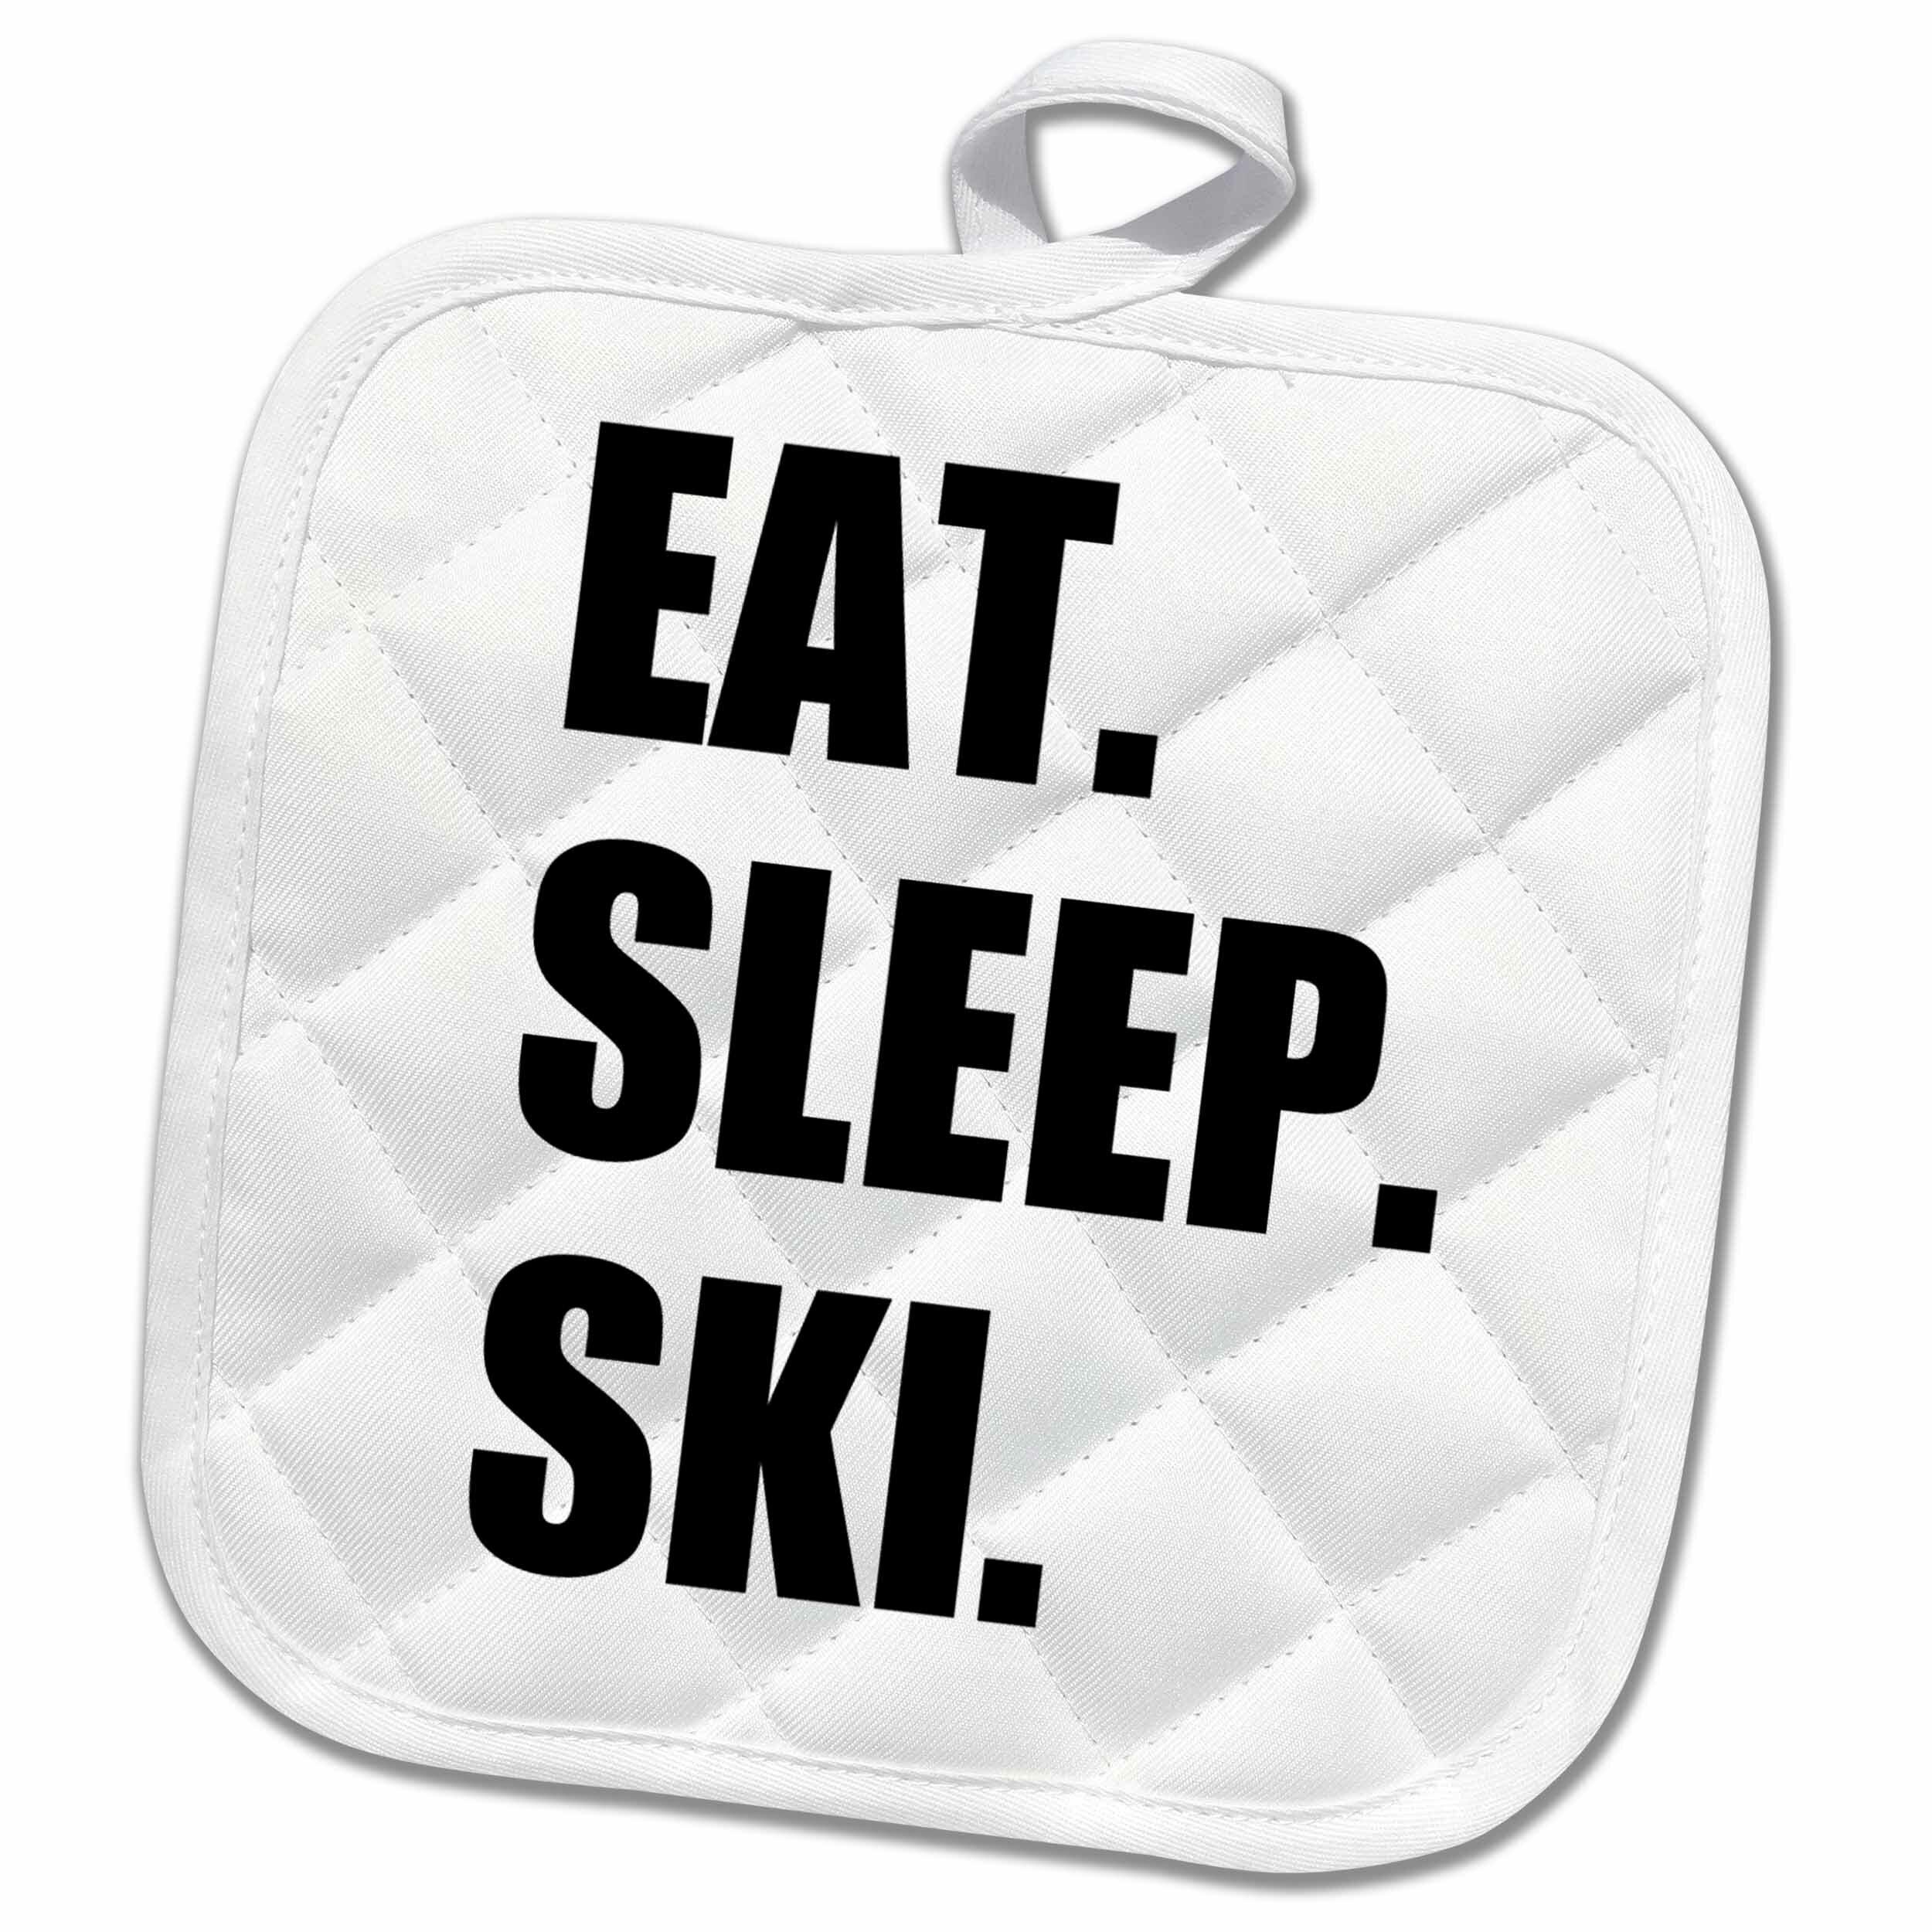 3drose Eat Sleep Ski Skiing Enthusiast Passionate Skier Sport Text Potholder Wayfair